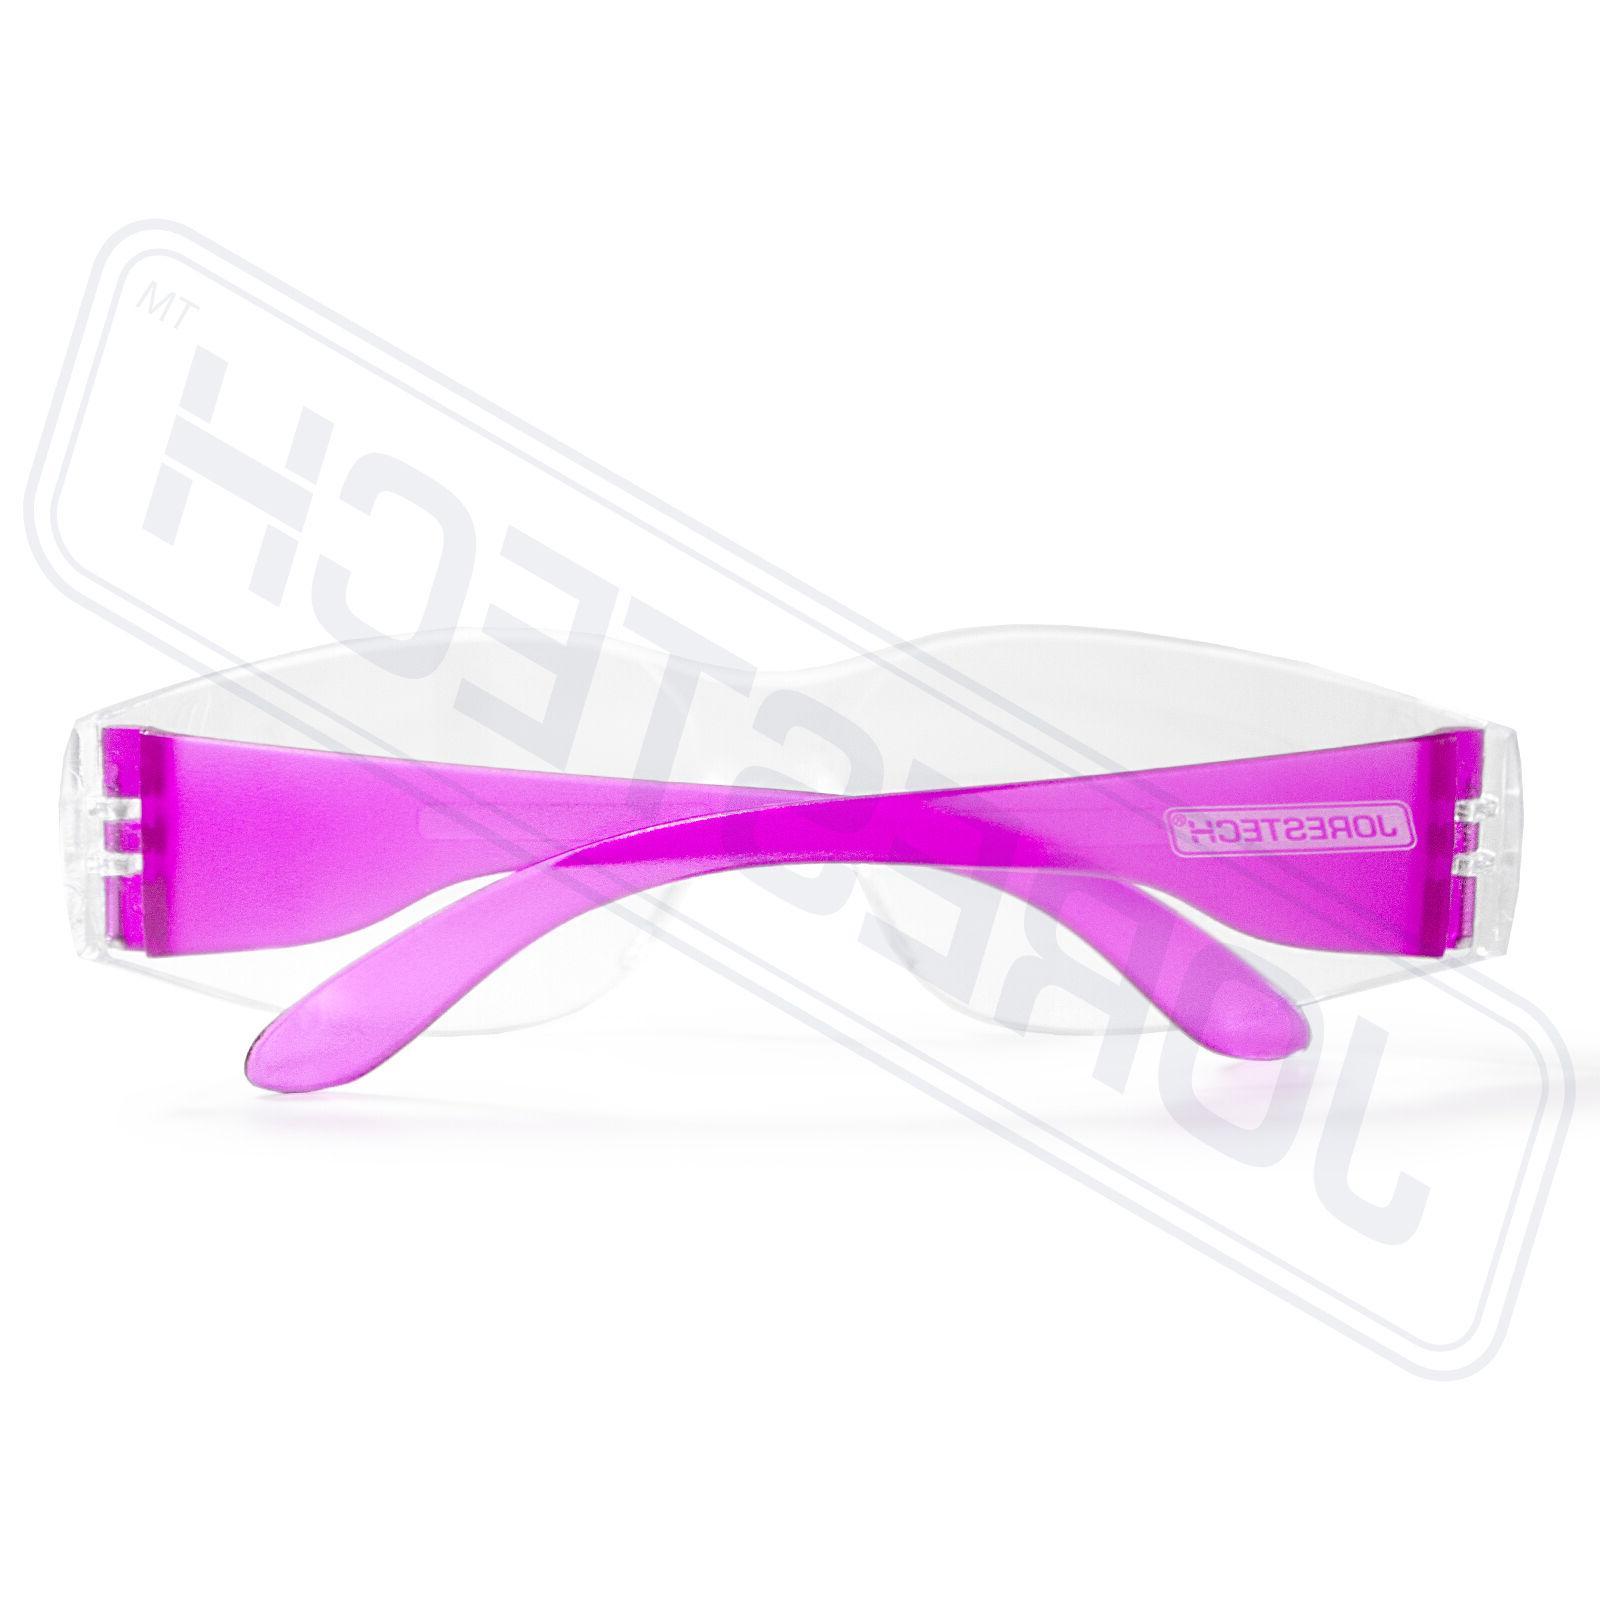 Jorestech Petite Women's Safety Glasses | Clear Lens